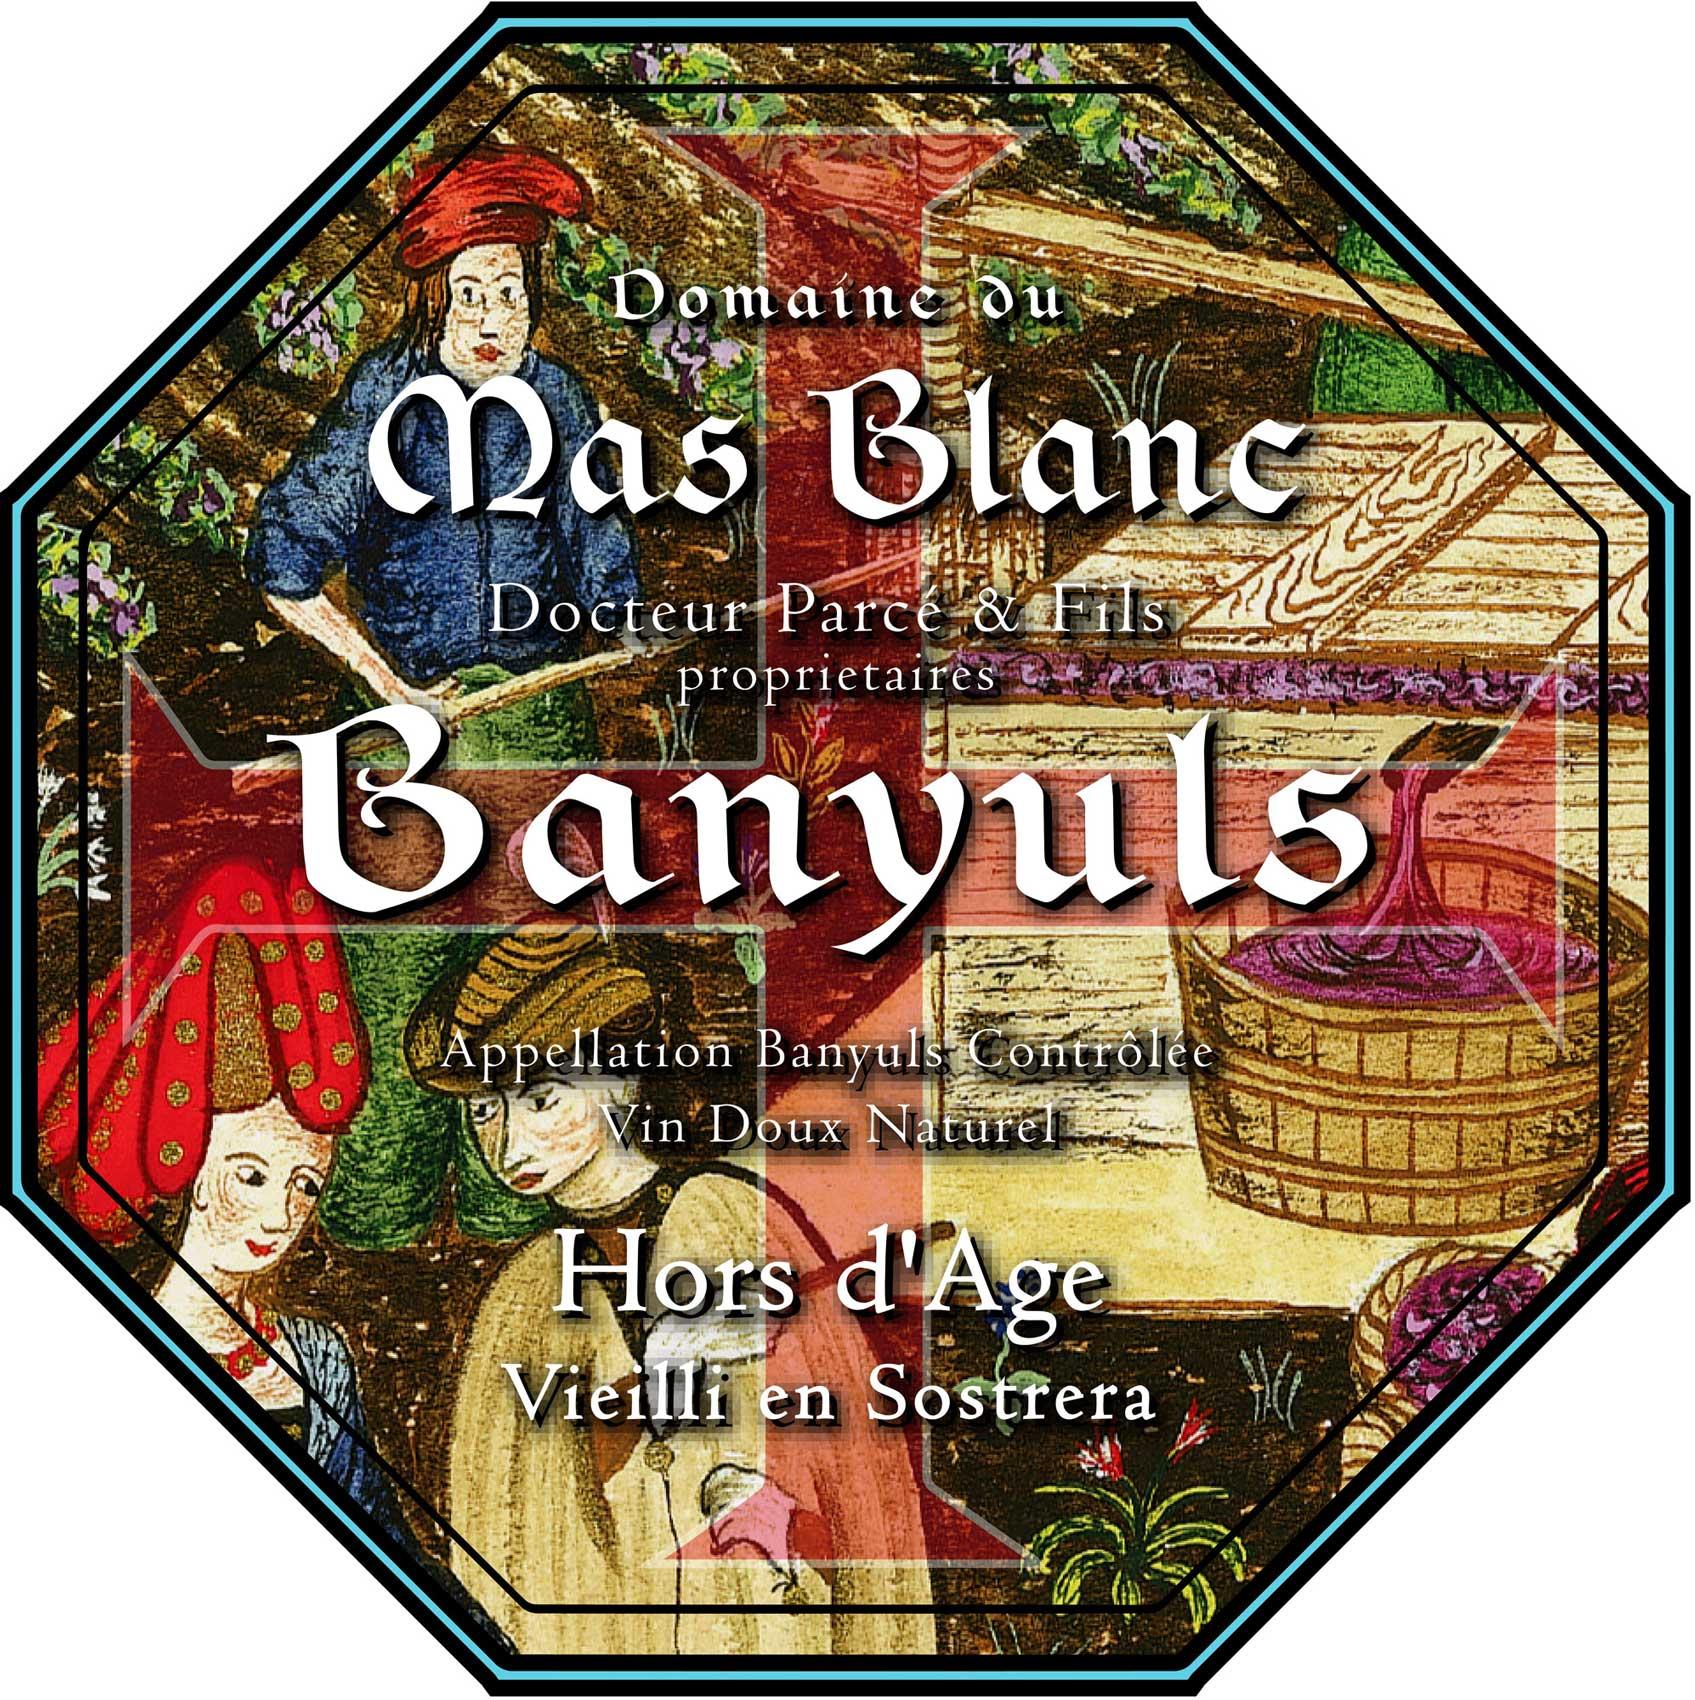 Domaine du Mas Blanc Banyuls Hors d'Age 'Sostrera'